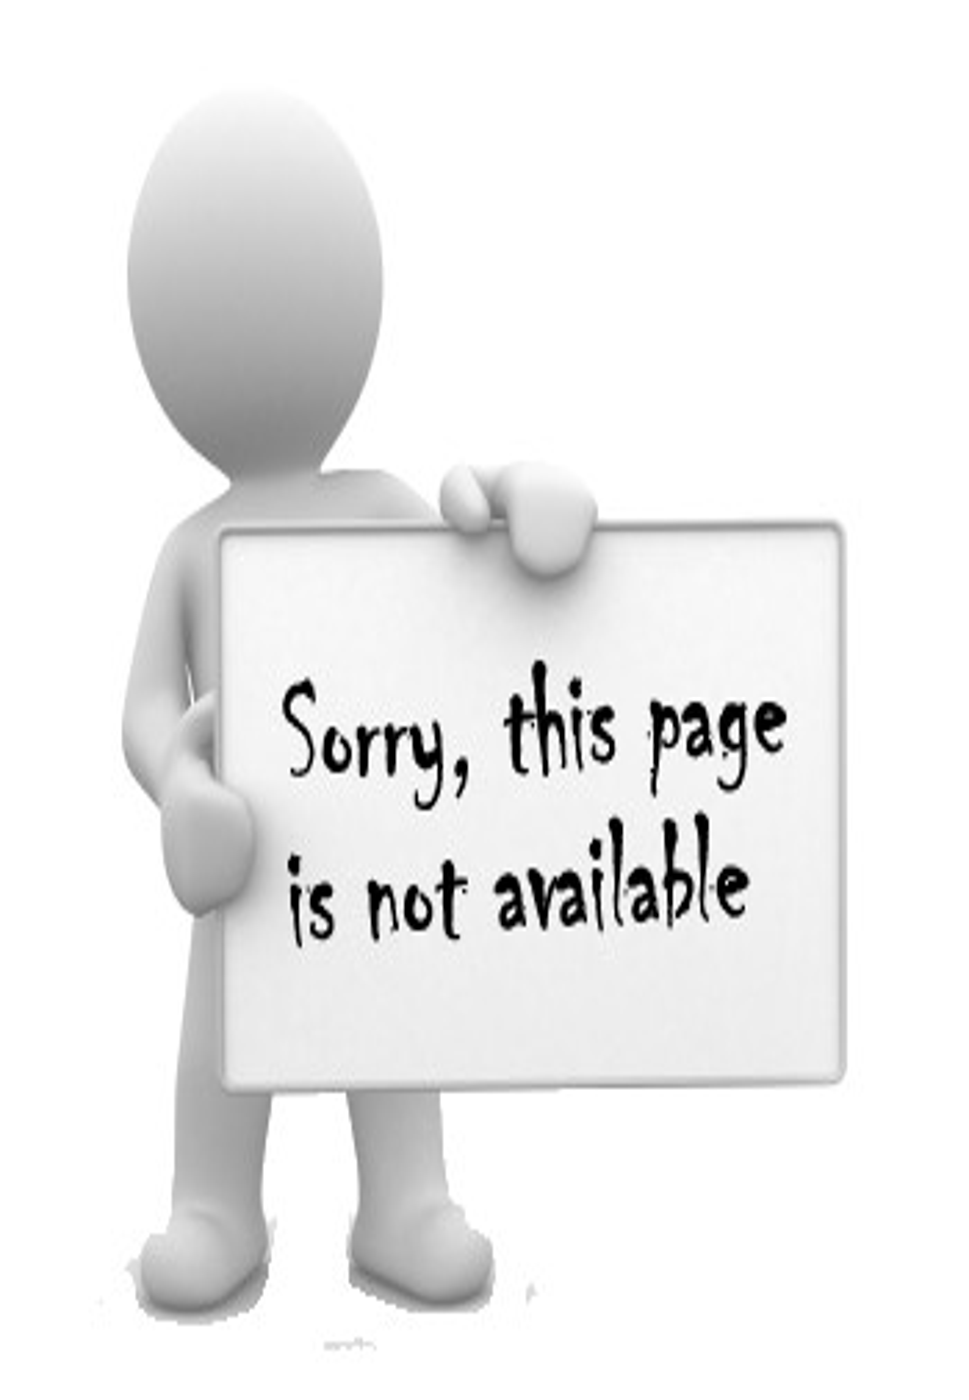 Youjo Senki - Chapter 43 - Page 3